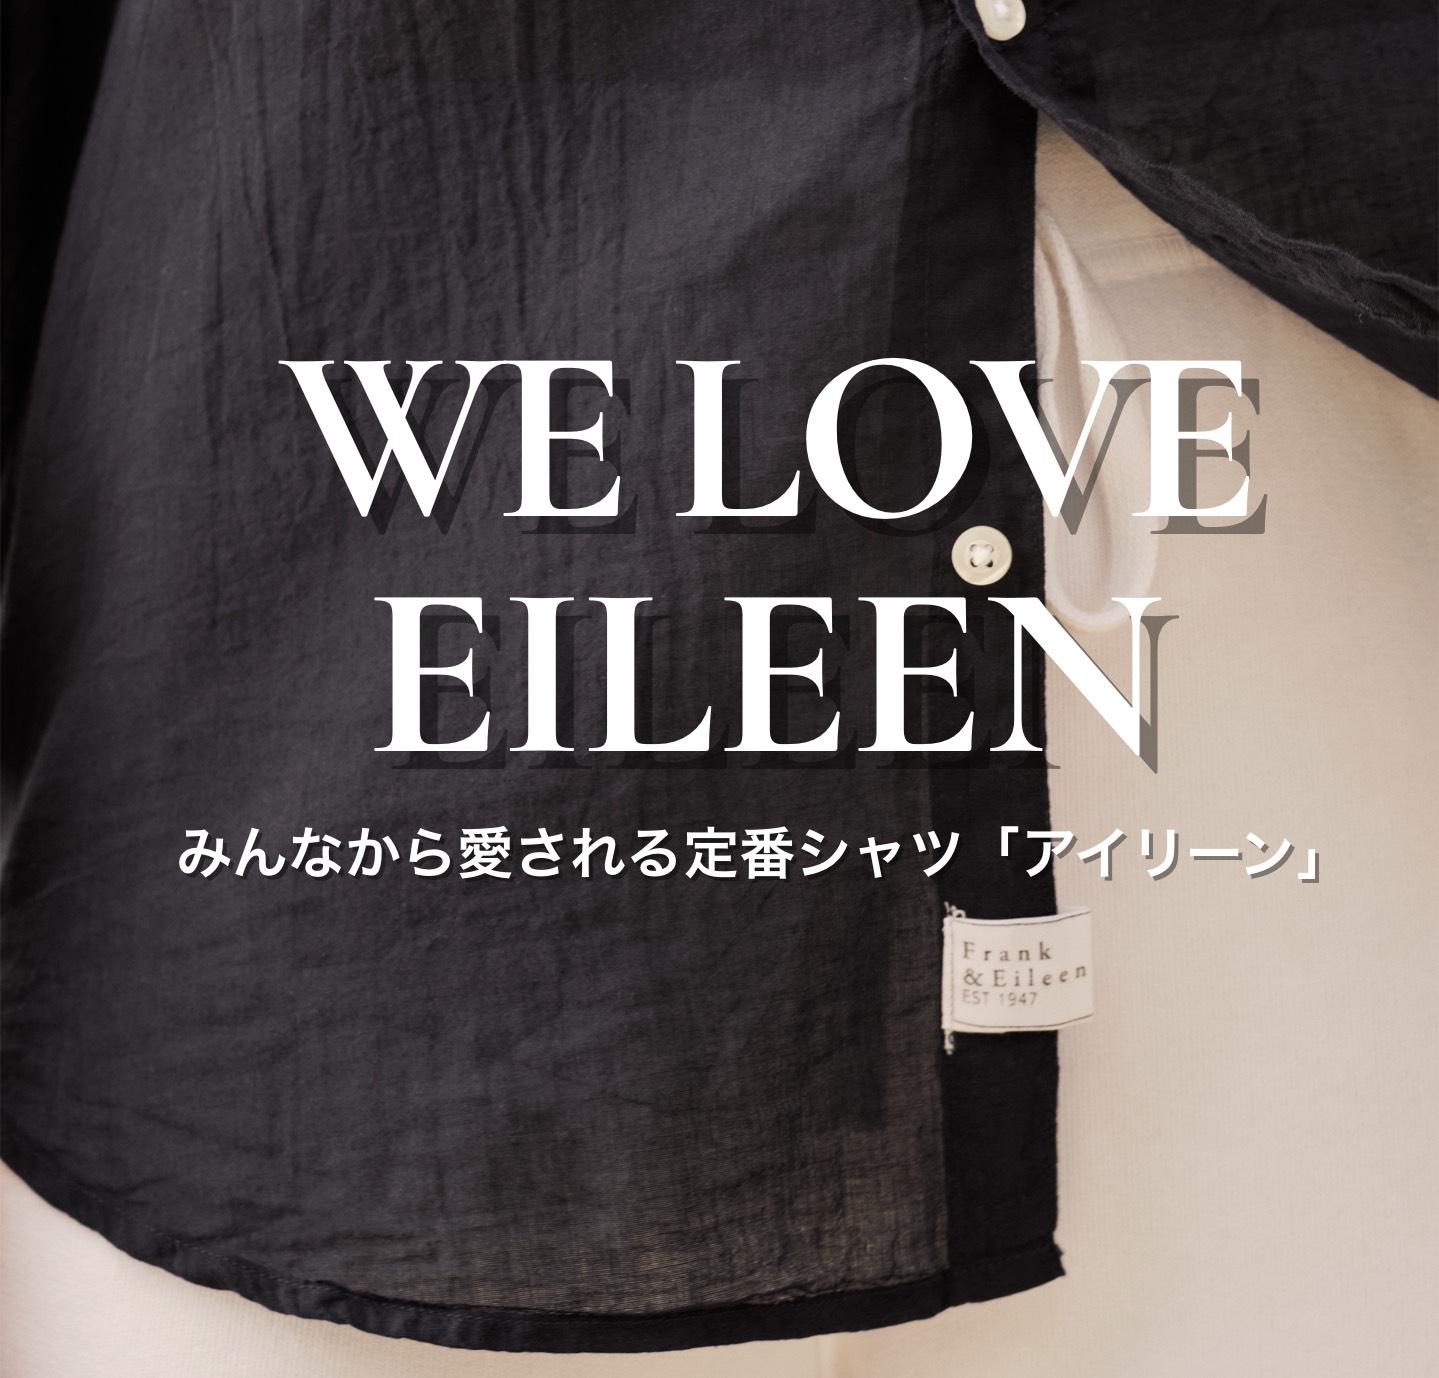 WE LOVE EILEEN